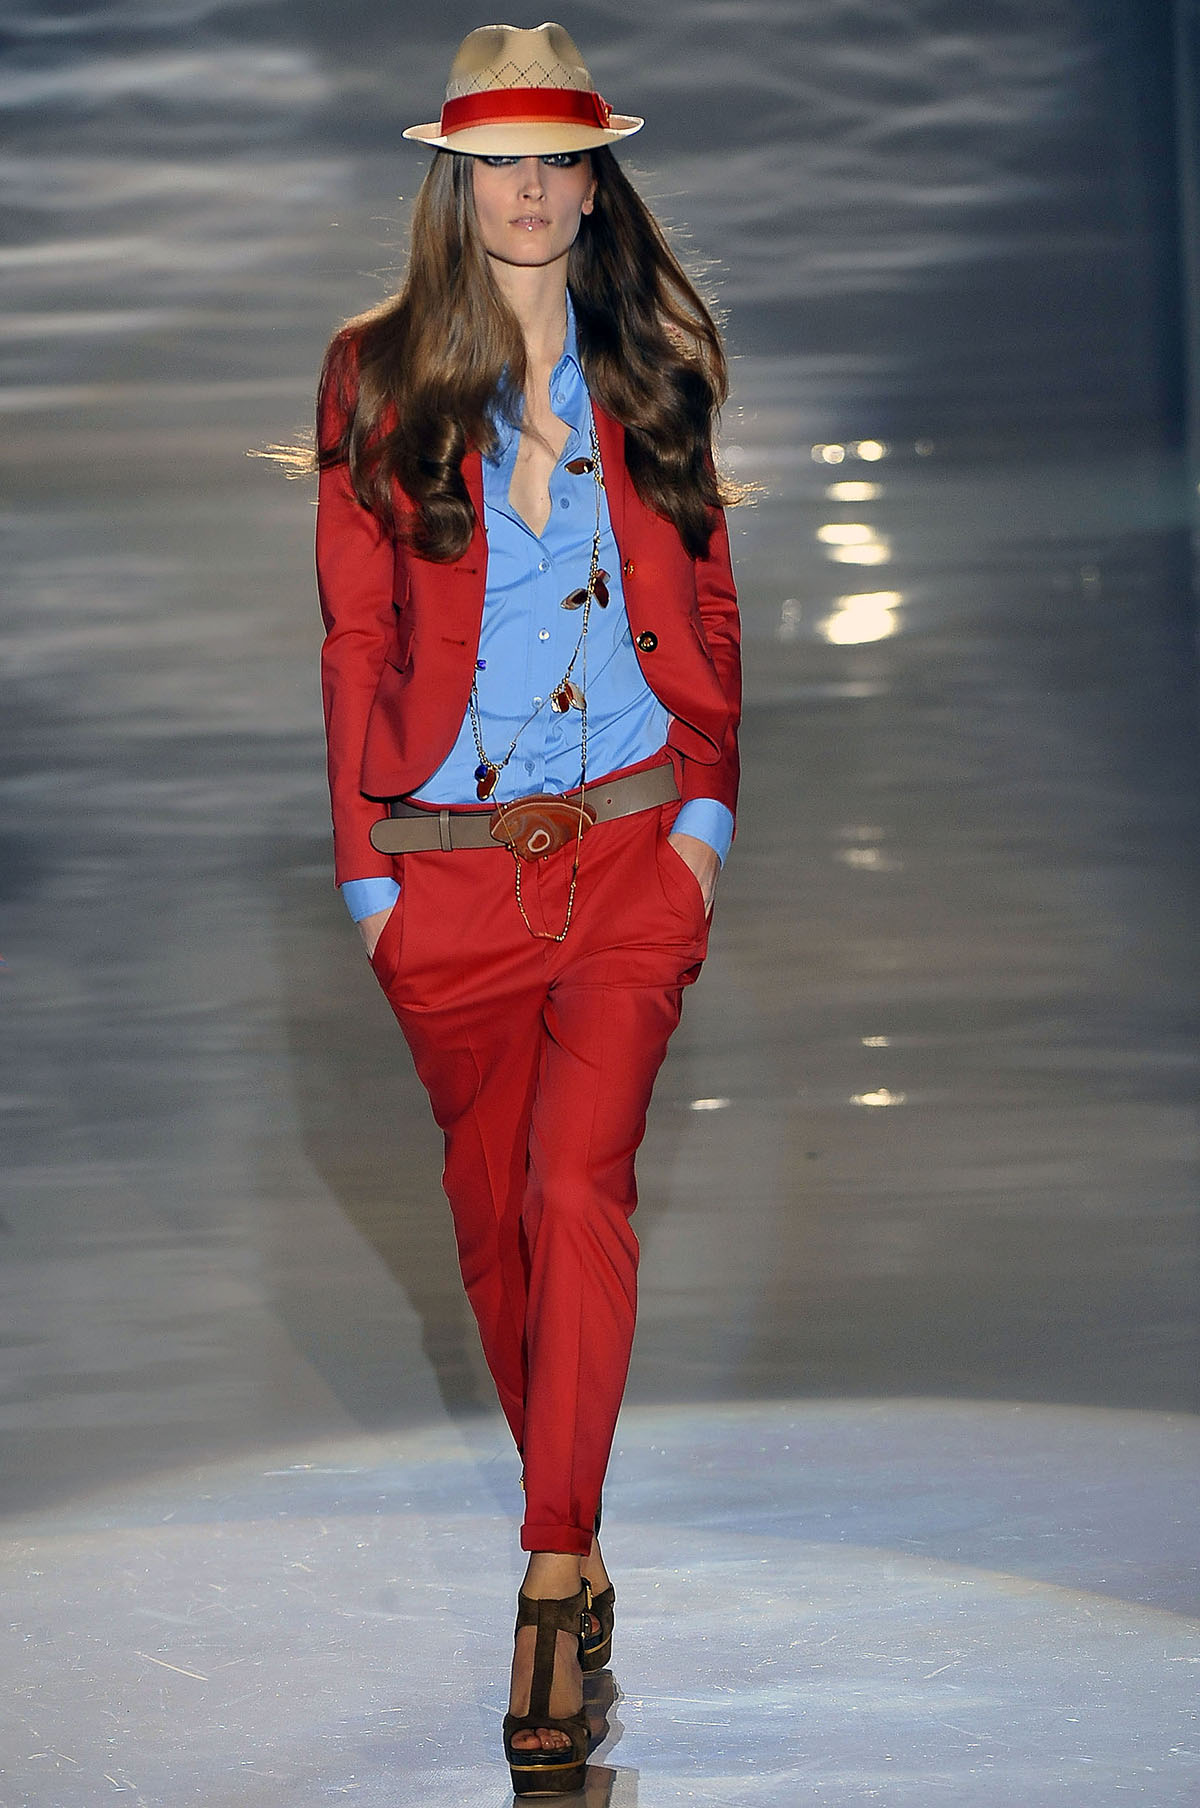 The perfect image photography Buy Plus Size Fashion Bodysuits - Ashley Stewart